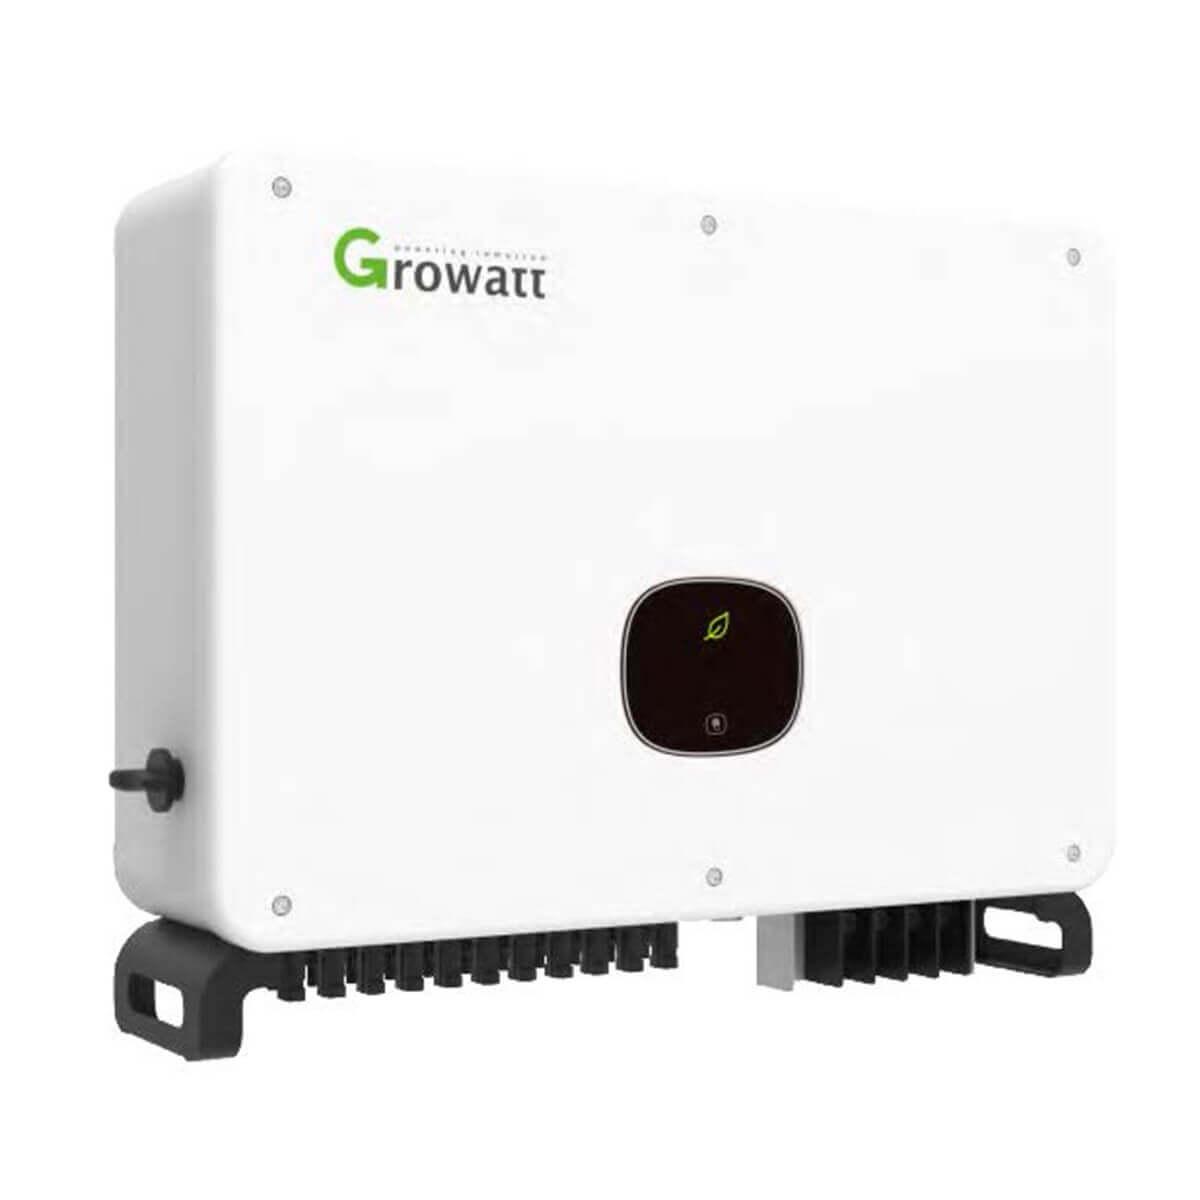 growatt 50kW inverter, growatt mac 50kW inverter, growatt mac 50ktl3-x lv-mv inverter, growatt mac 50ktl3-x lv-mv, growatt mac 50 kW, GROWATT 50 KW